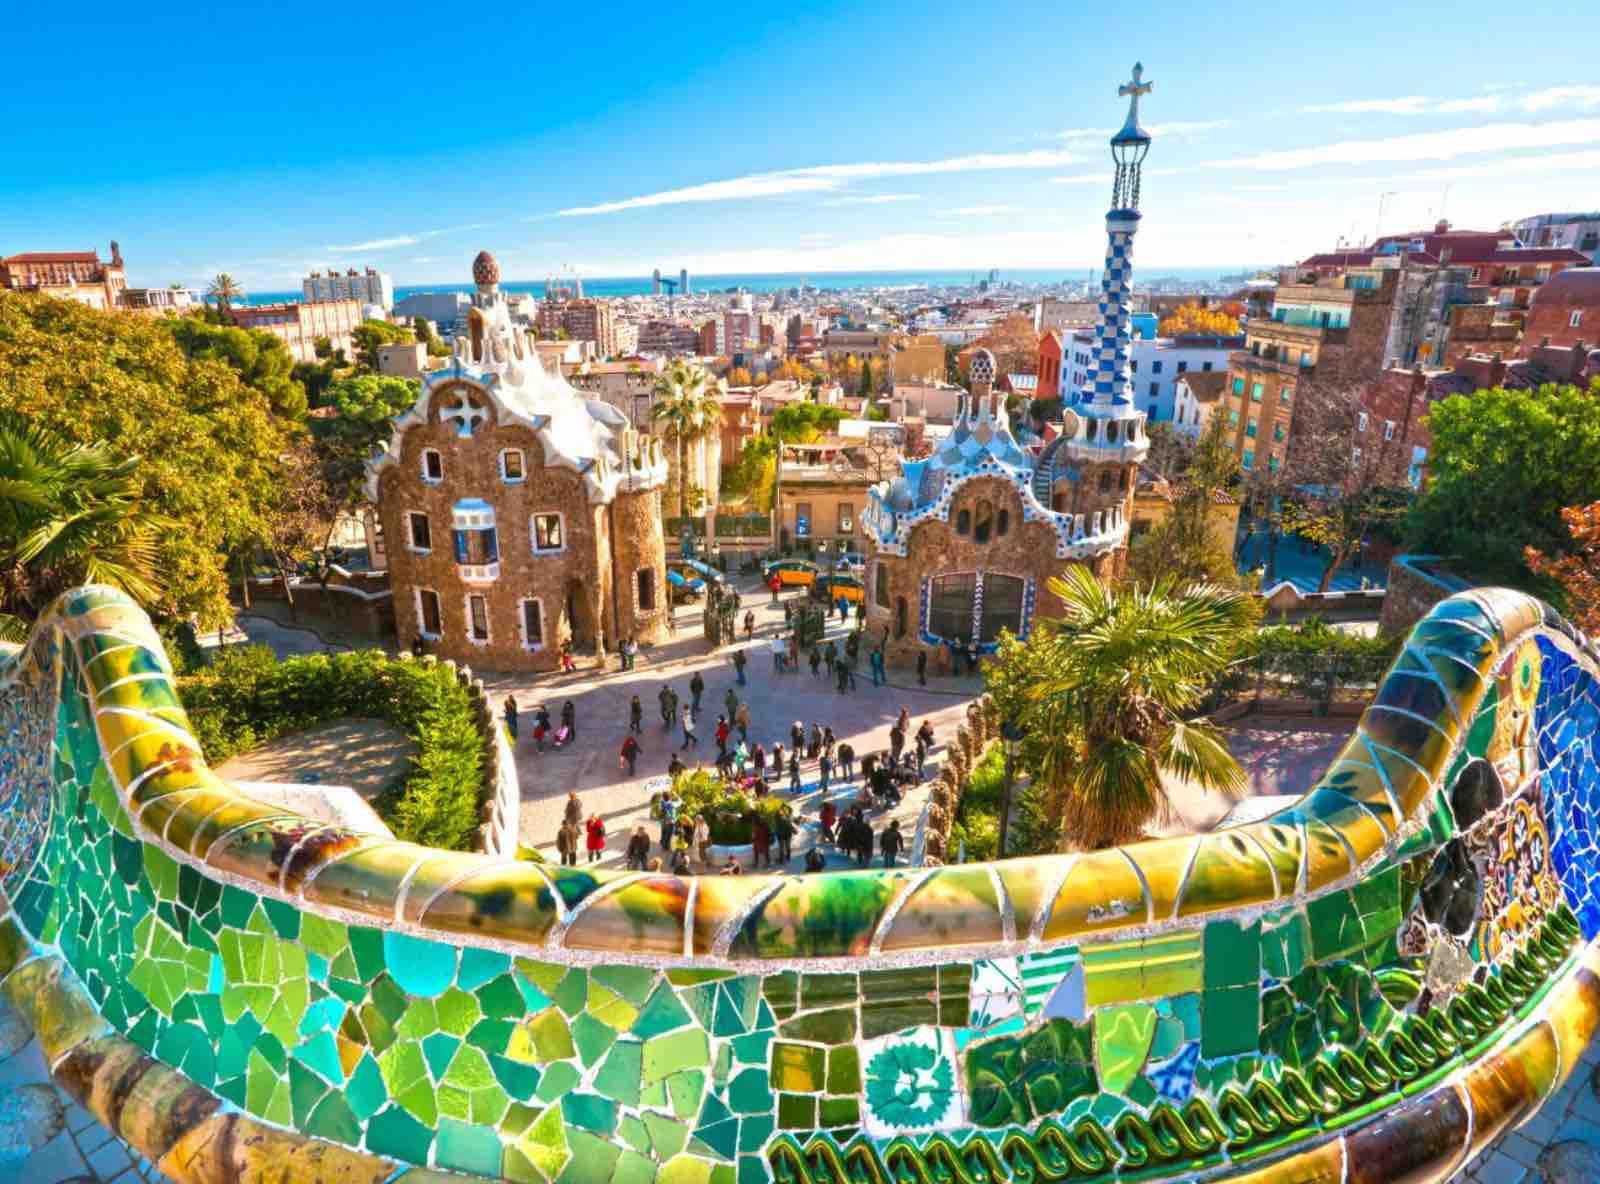 Next destination – Barcelona